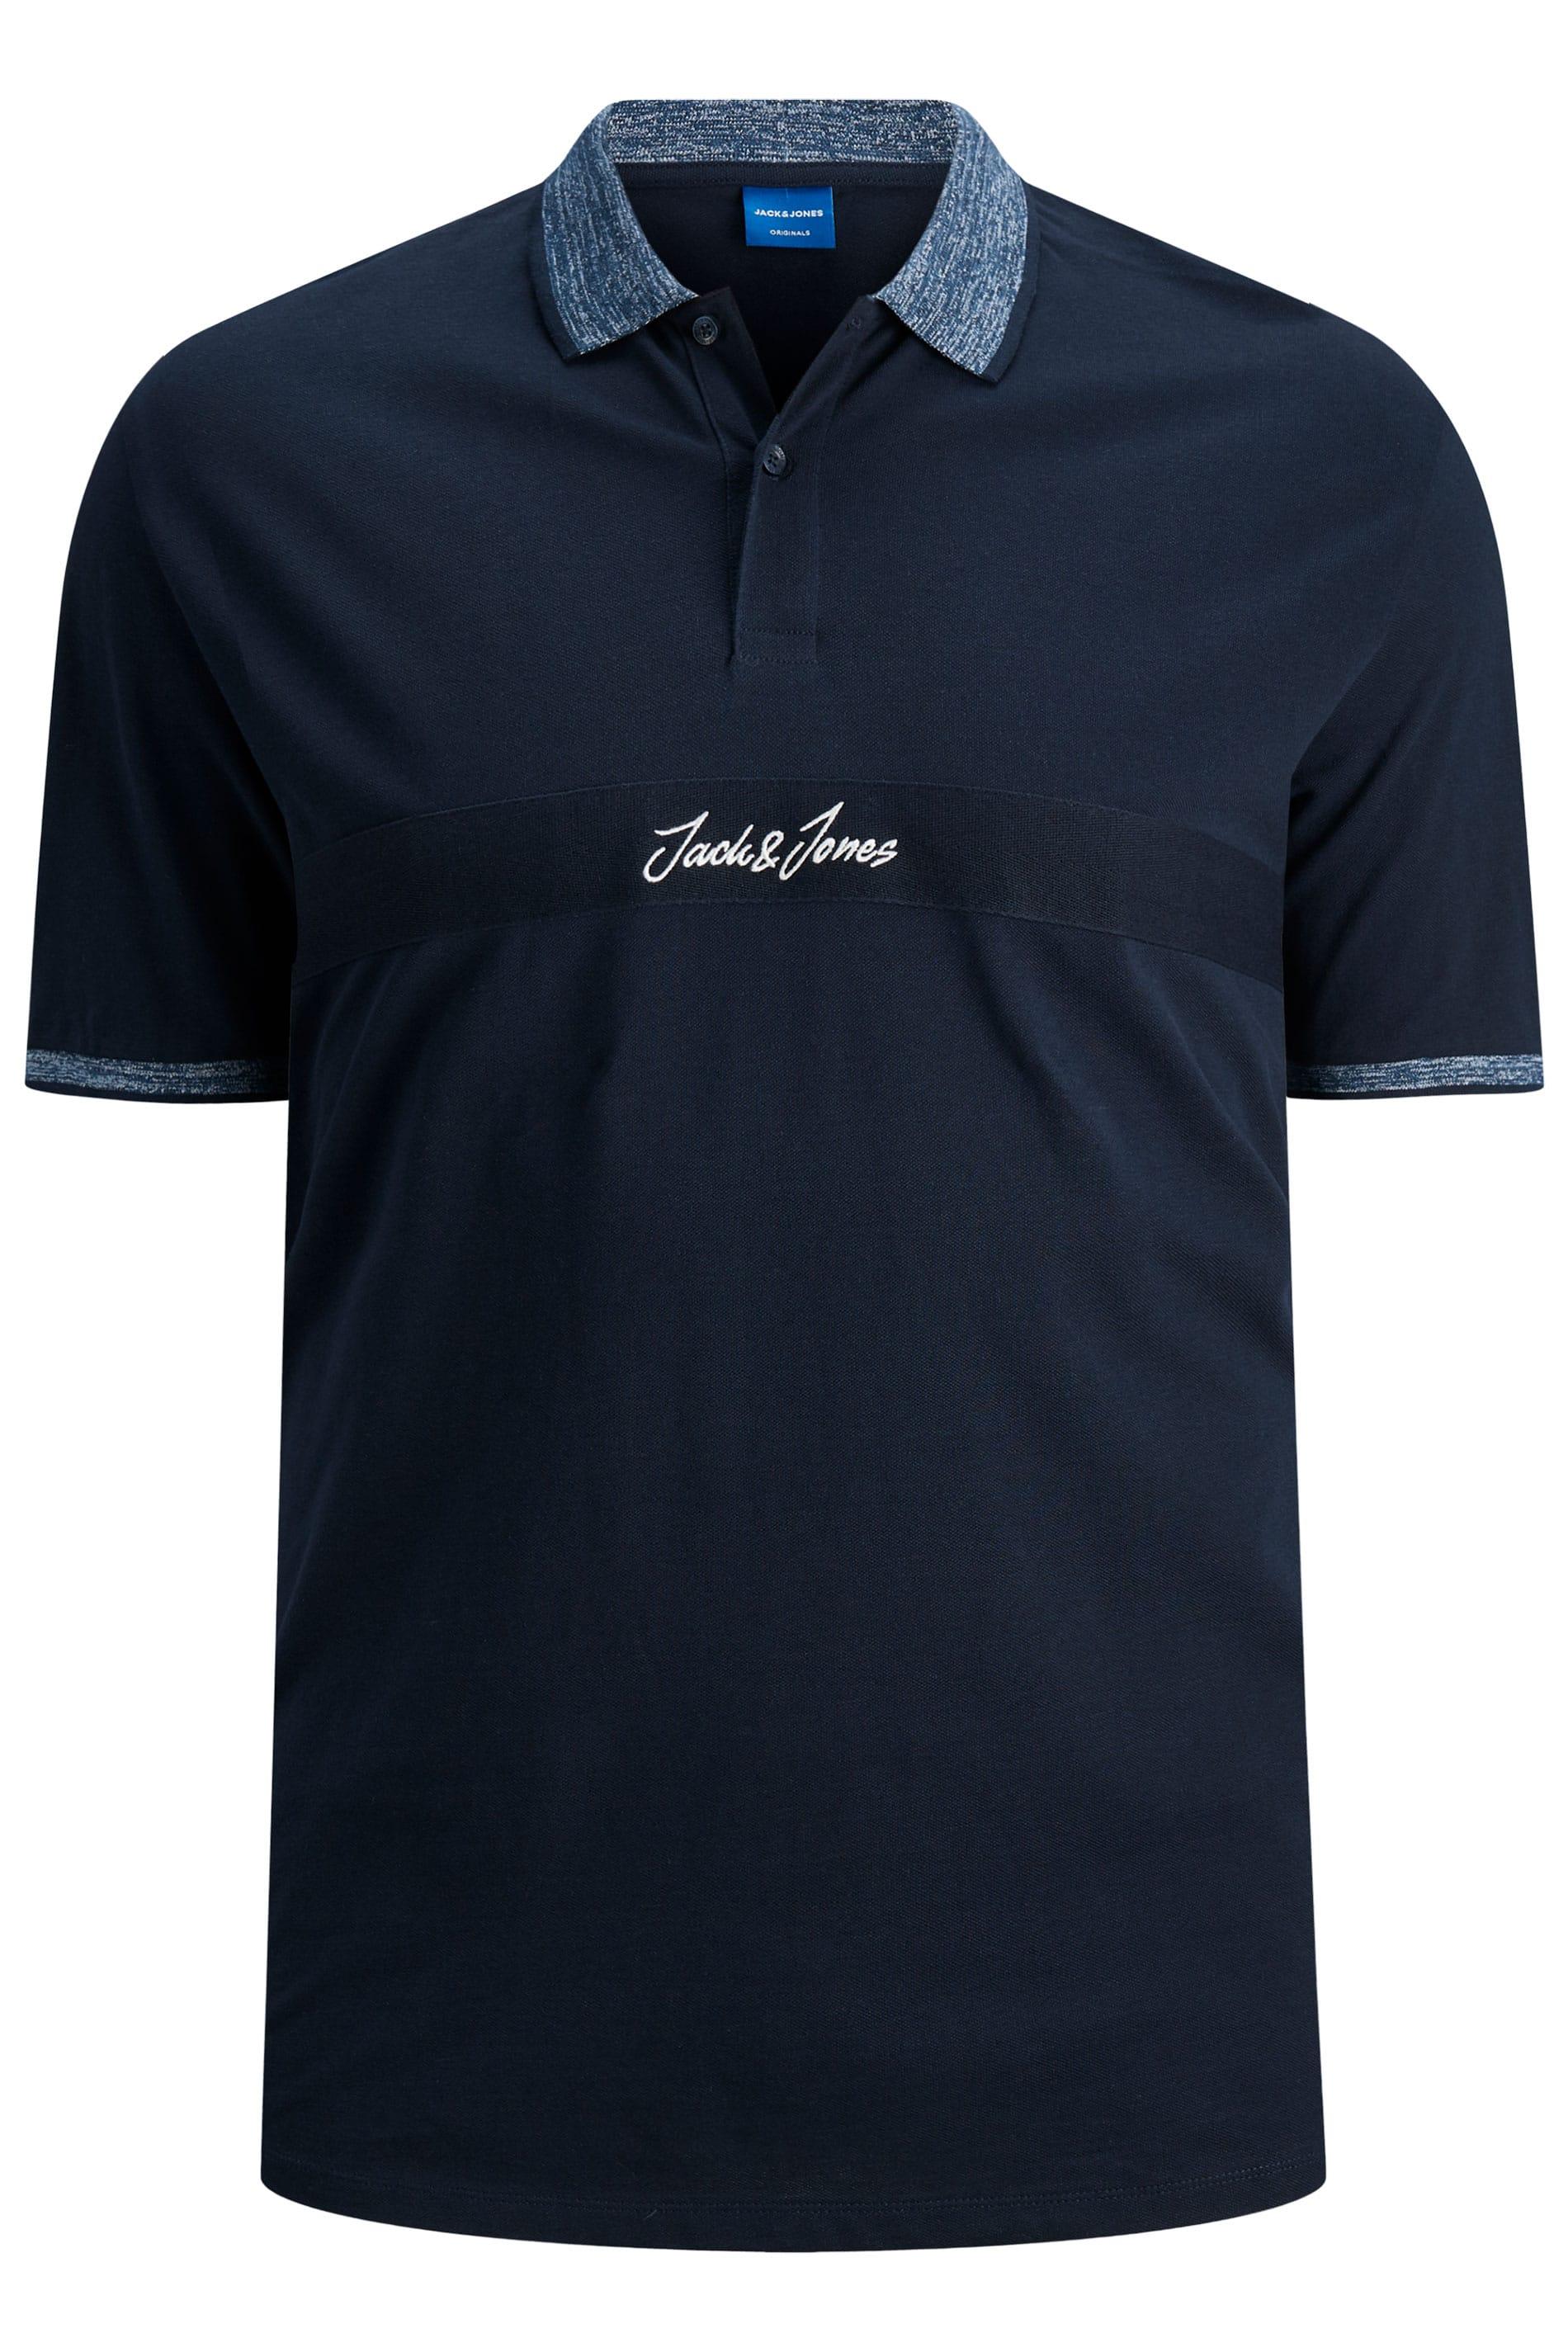 JACK & JONES Navy Contrast Polo Shirt